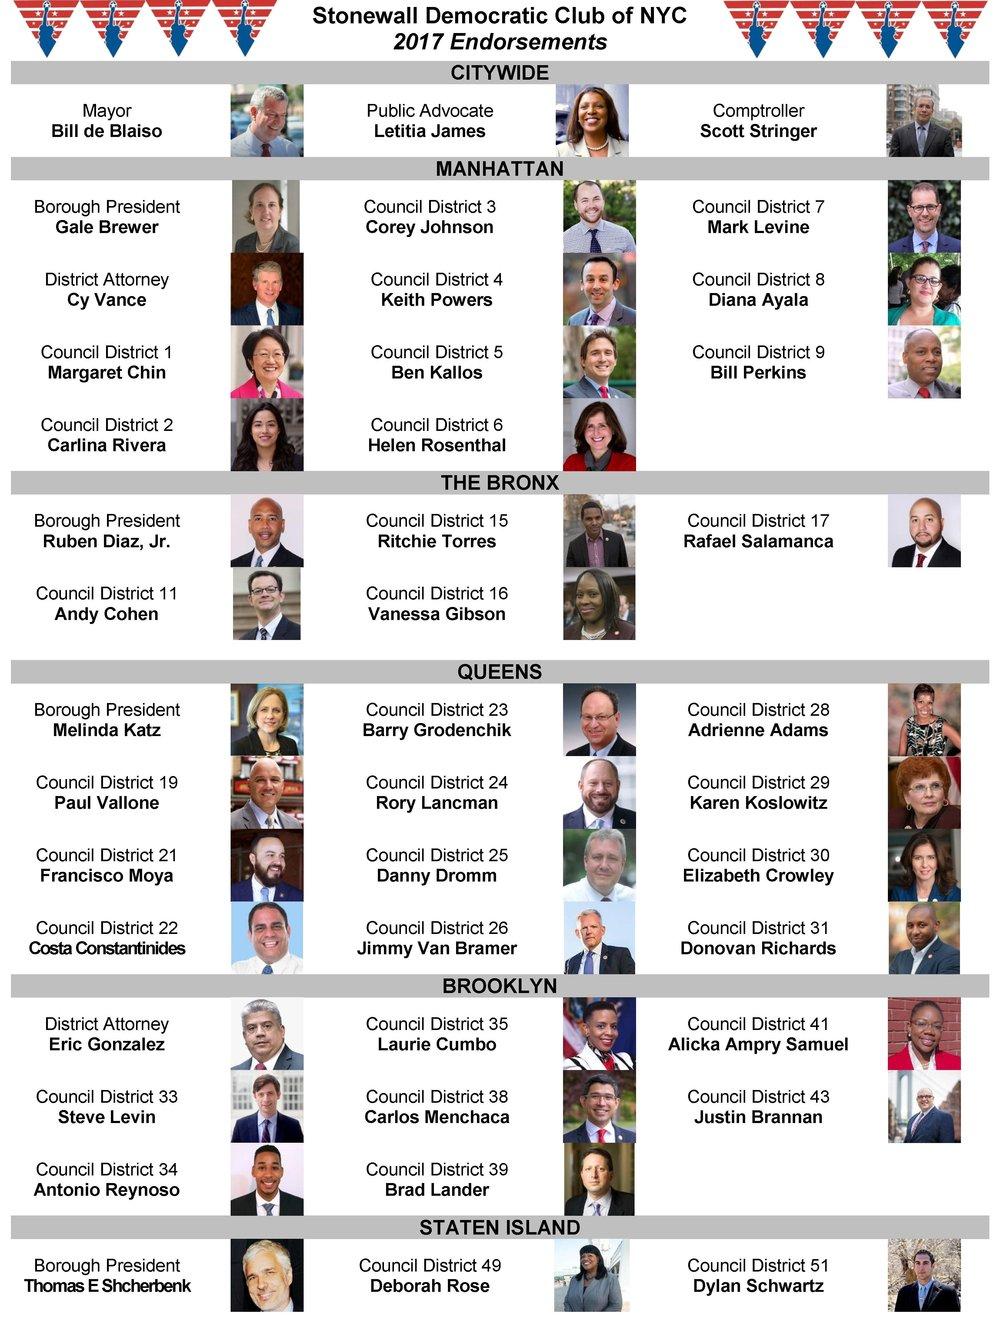 sdnyc endorsed candidates 2017 general election.jpg